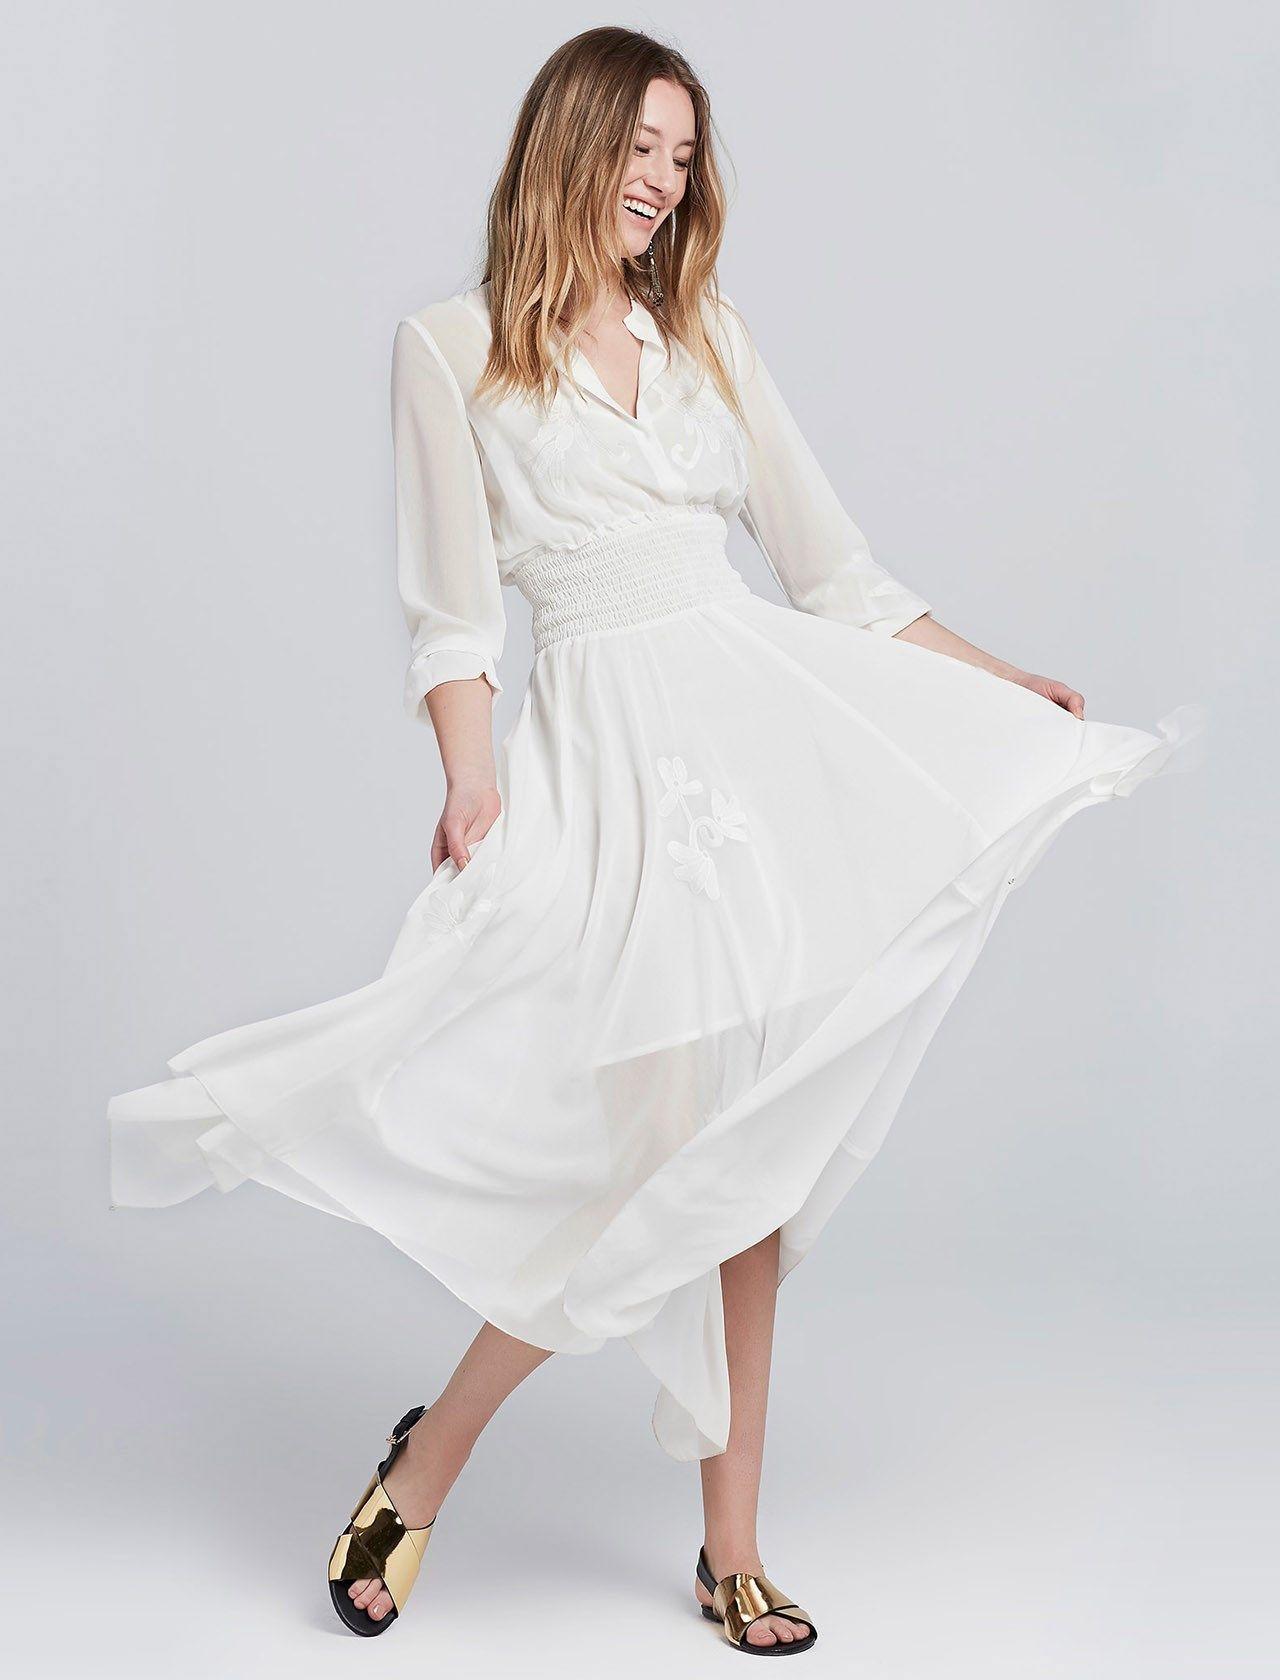 Ipekyol Ipekyol Beyaz Kadin Elbise Elbise Kadin The Dress Elbise